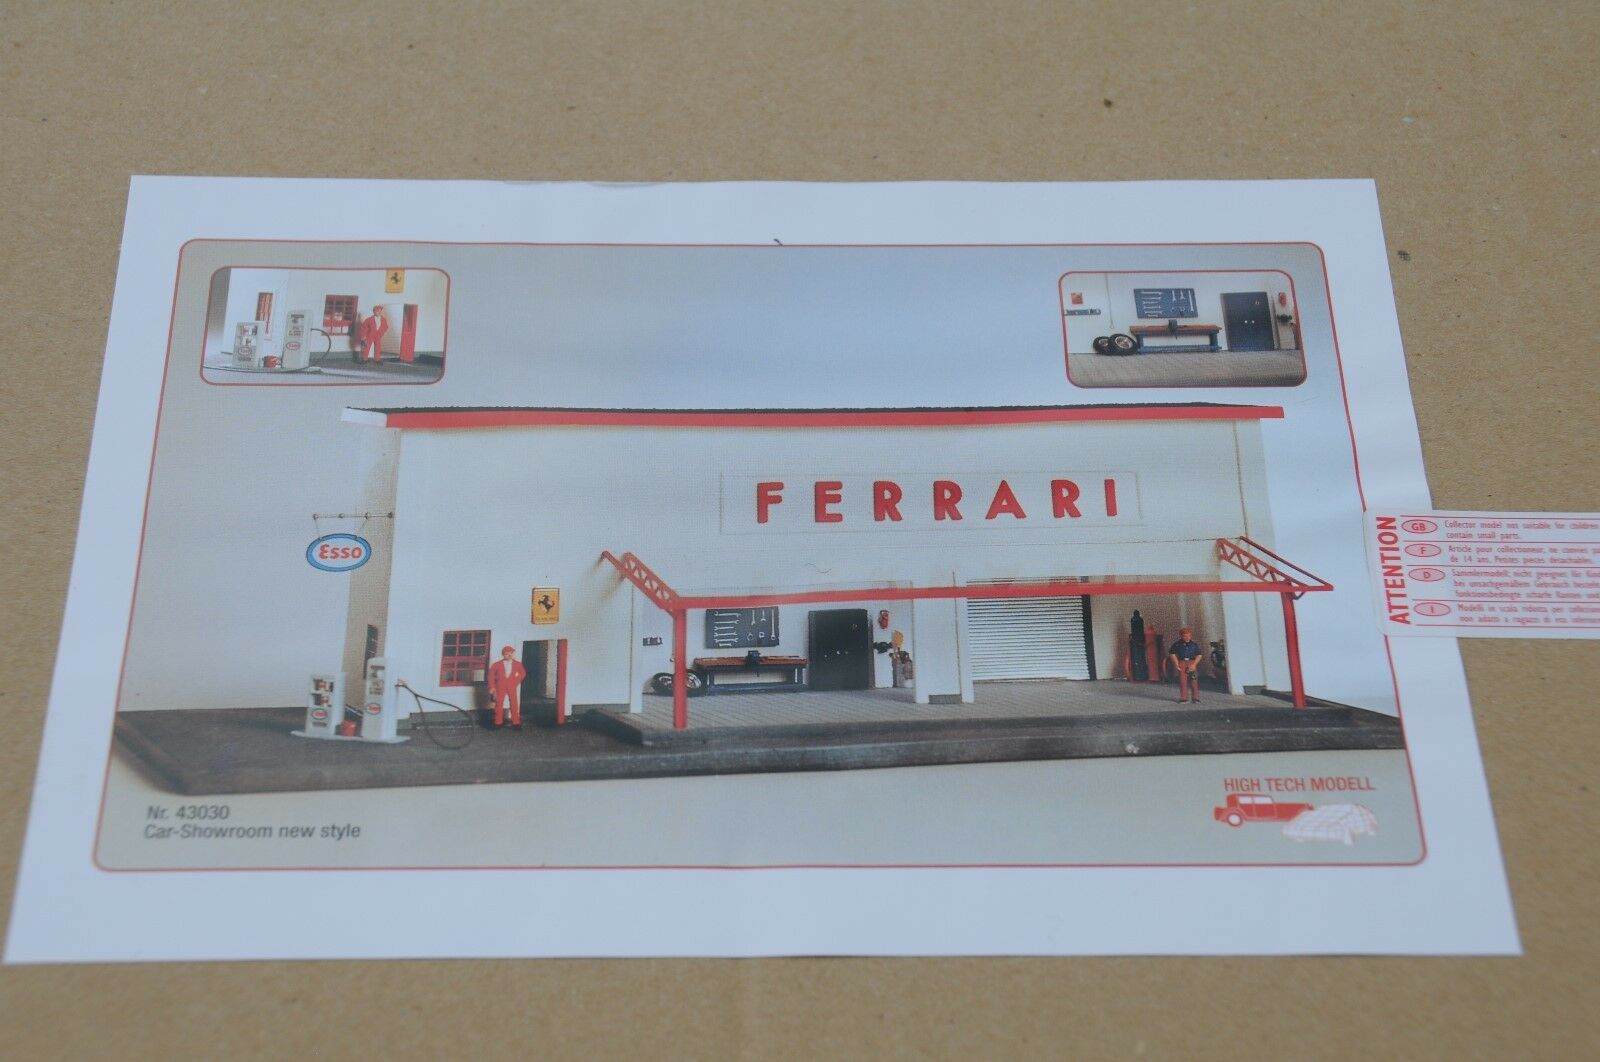 Exoto 43 Hi-Tech Hi-Tech Hi-Tech   Ferrari Prep & Service Facility   1 43 Garage    EHT00001 21bbaa